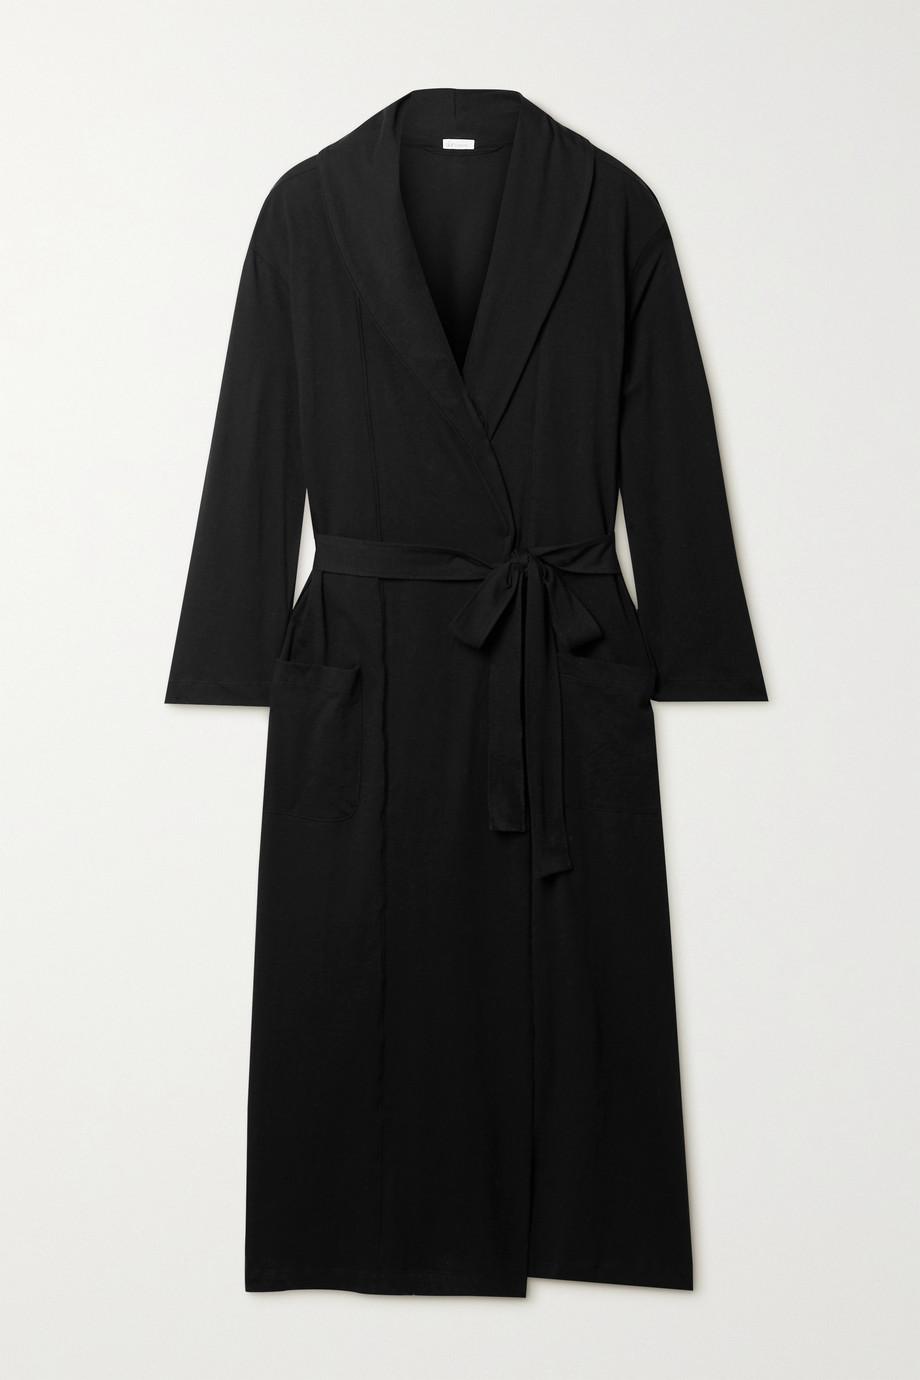 Skin + NET SUSTAIN Carina organic Pima cotton-jersey robe